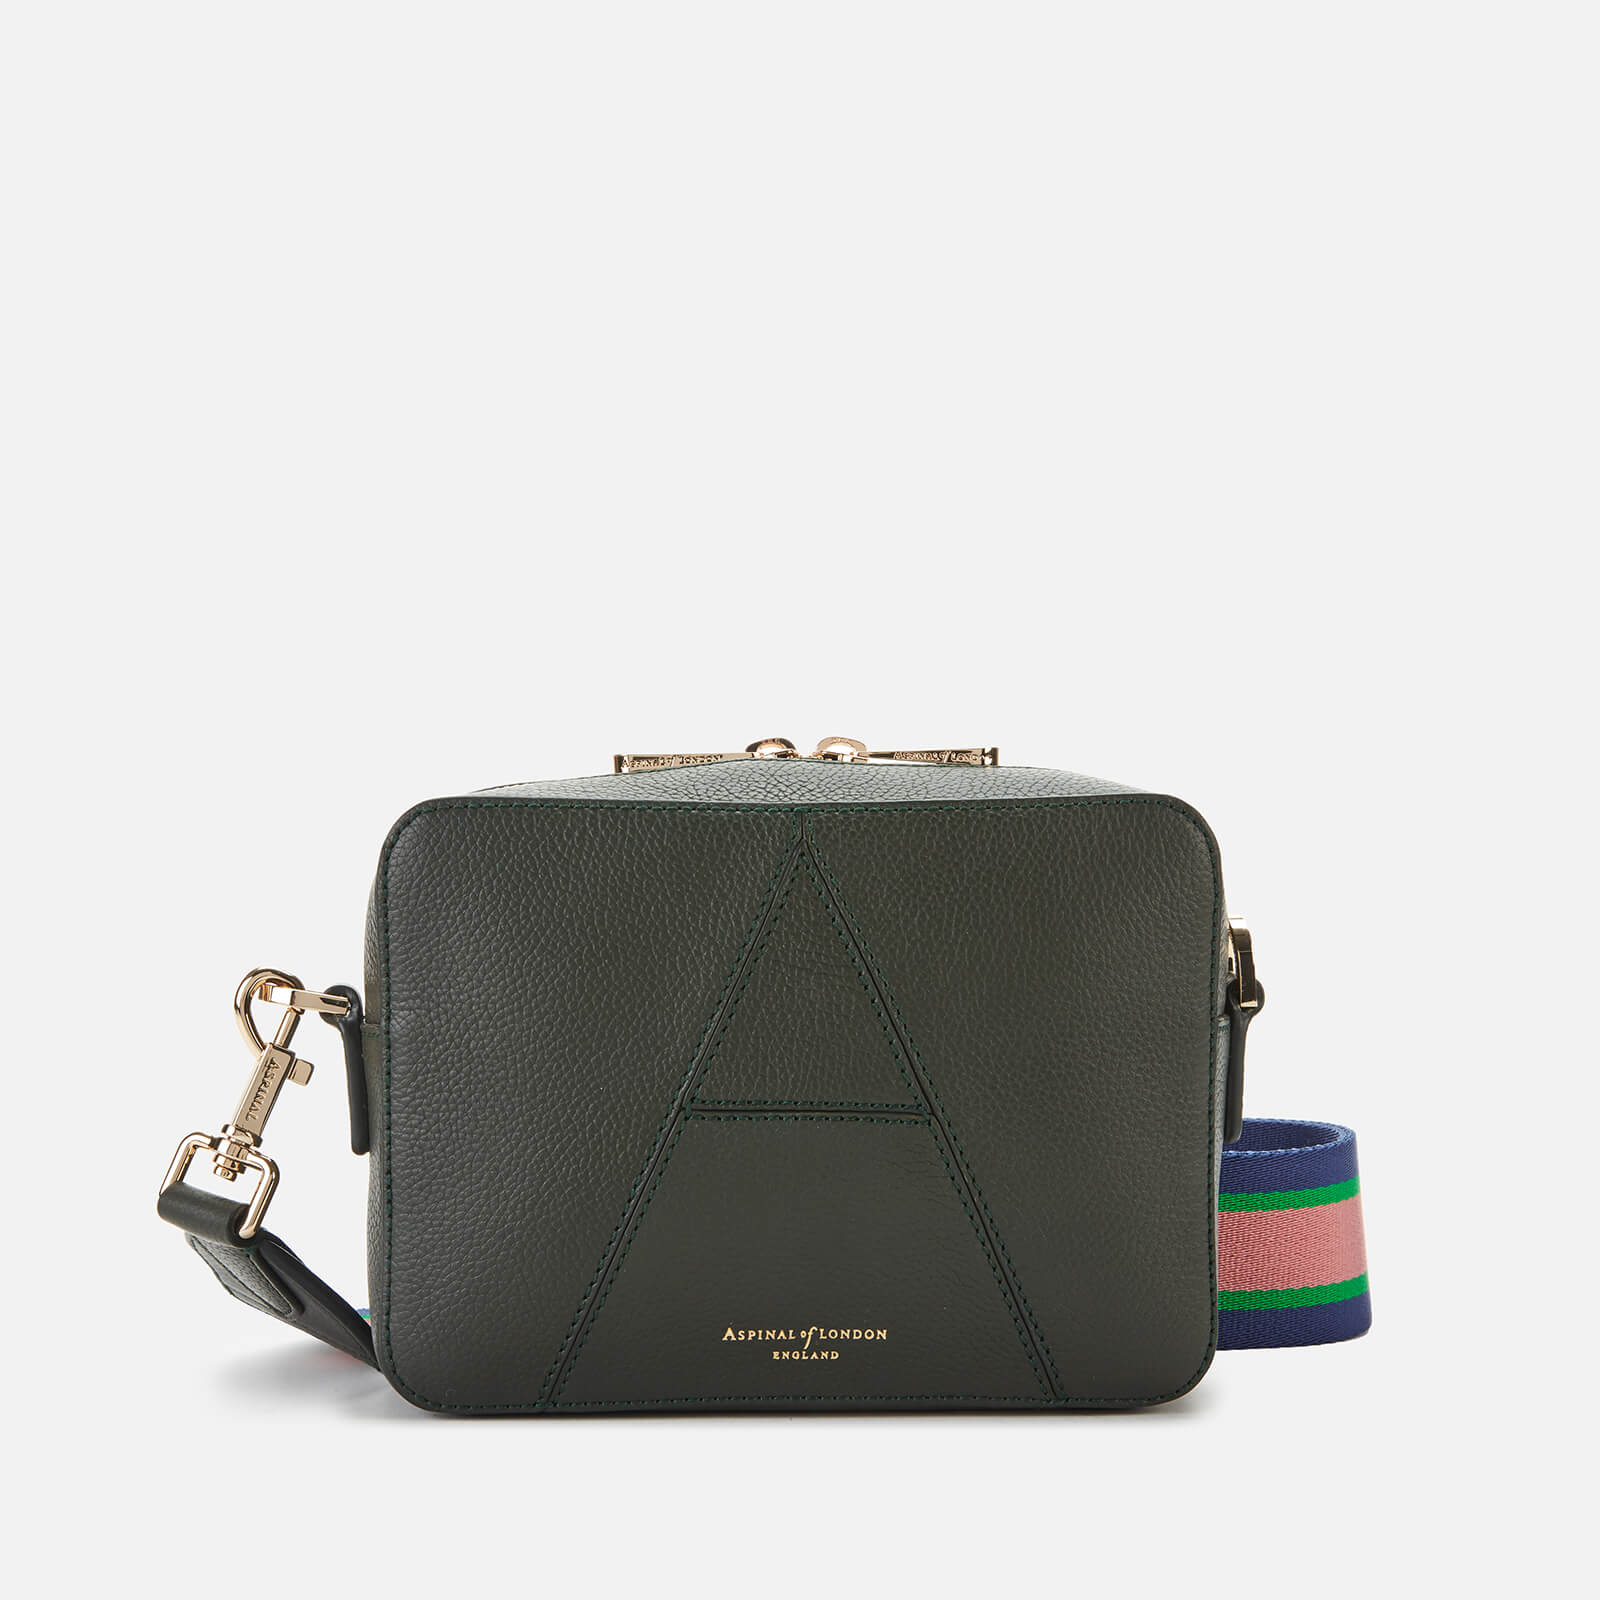 Aspinal of London Women's Camera Bag - Evergreen